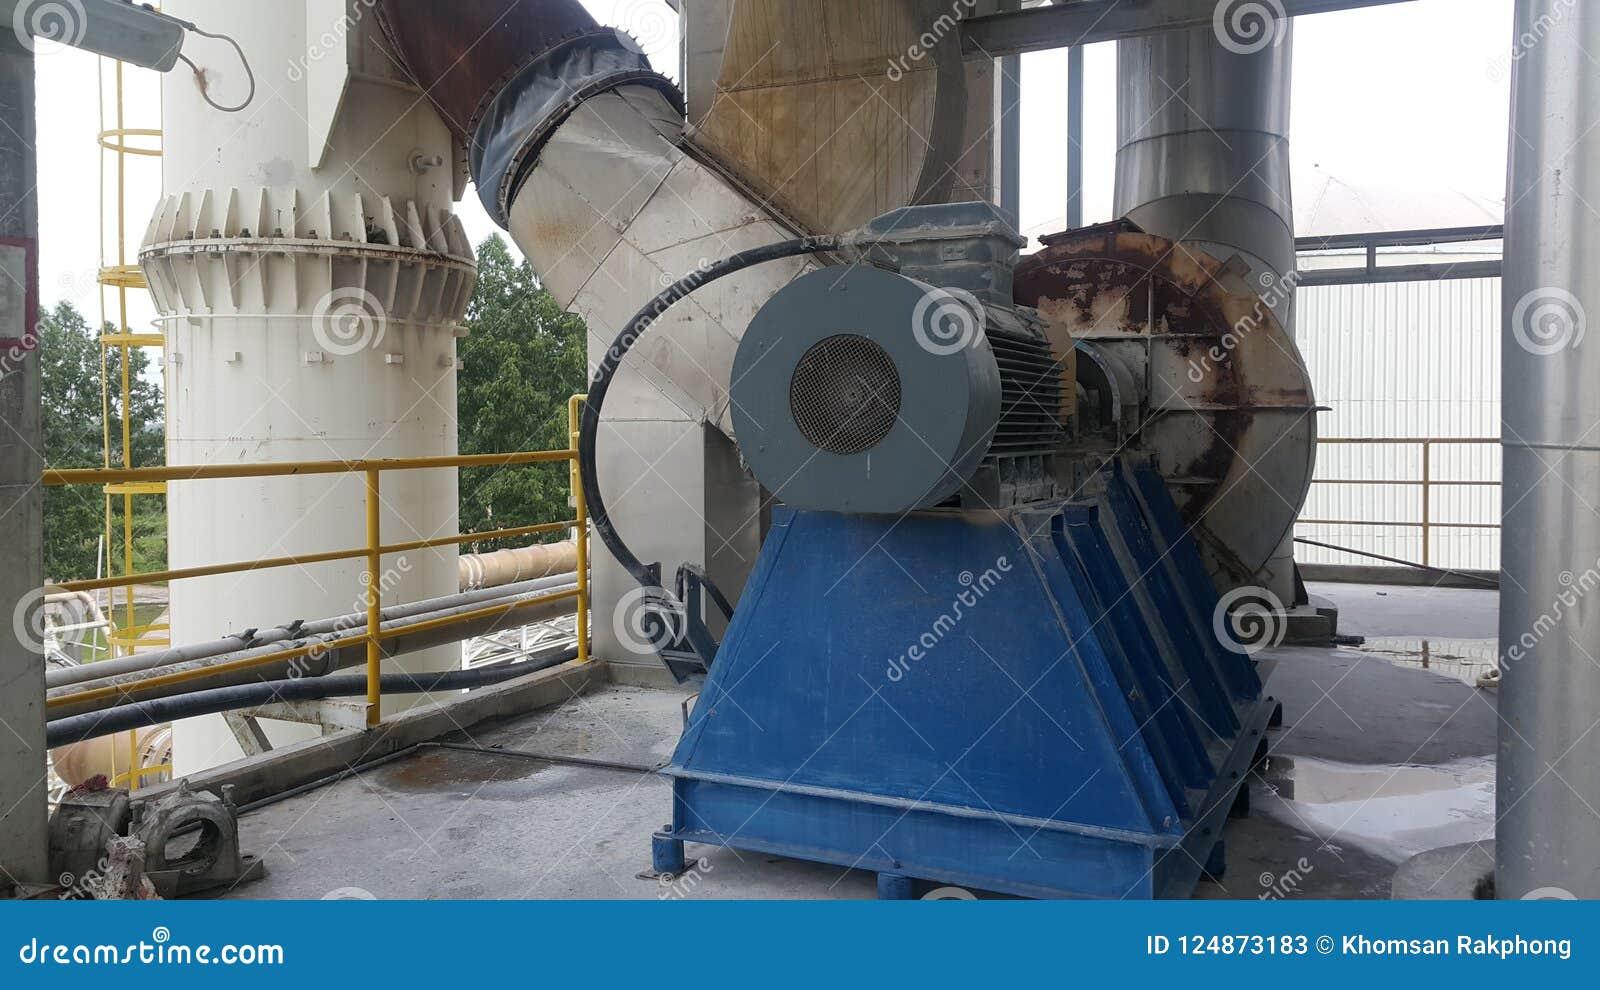 Electrical motor and flue gas fan of Electrostatic Precipitator